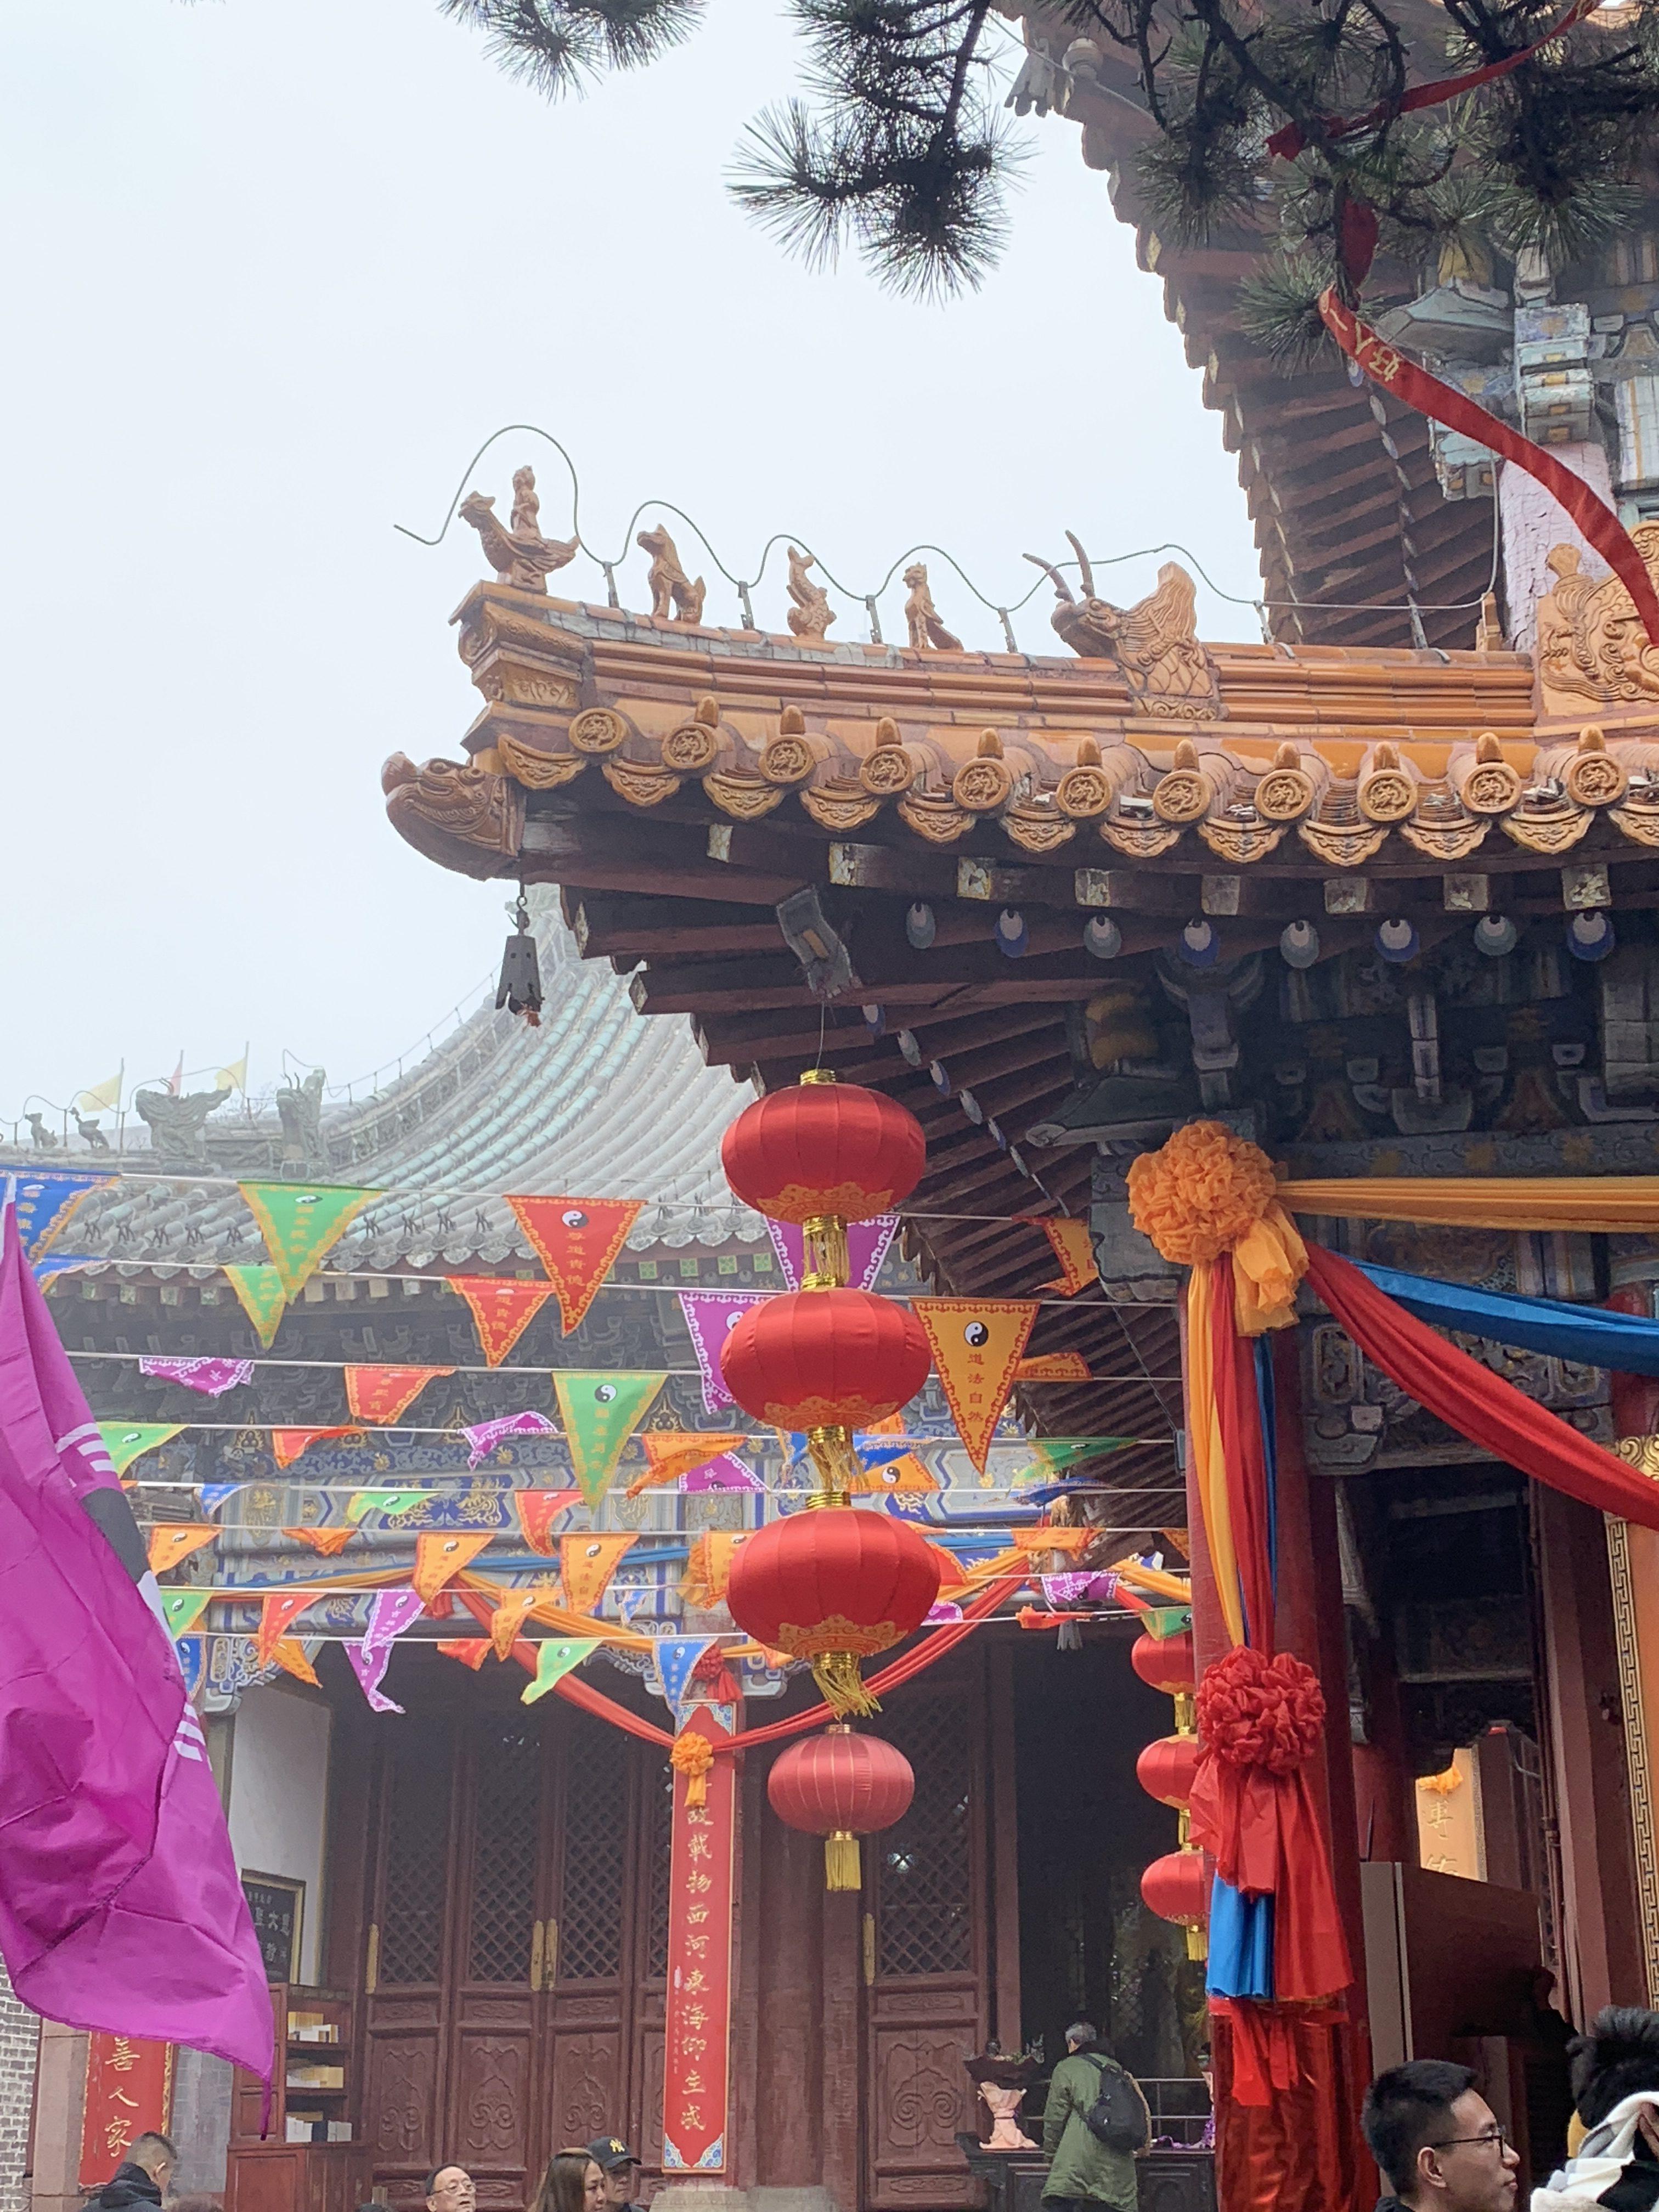 Shandong festival decor